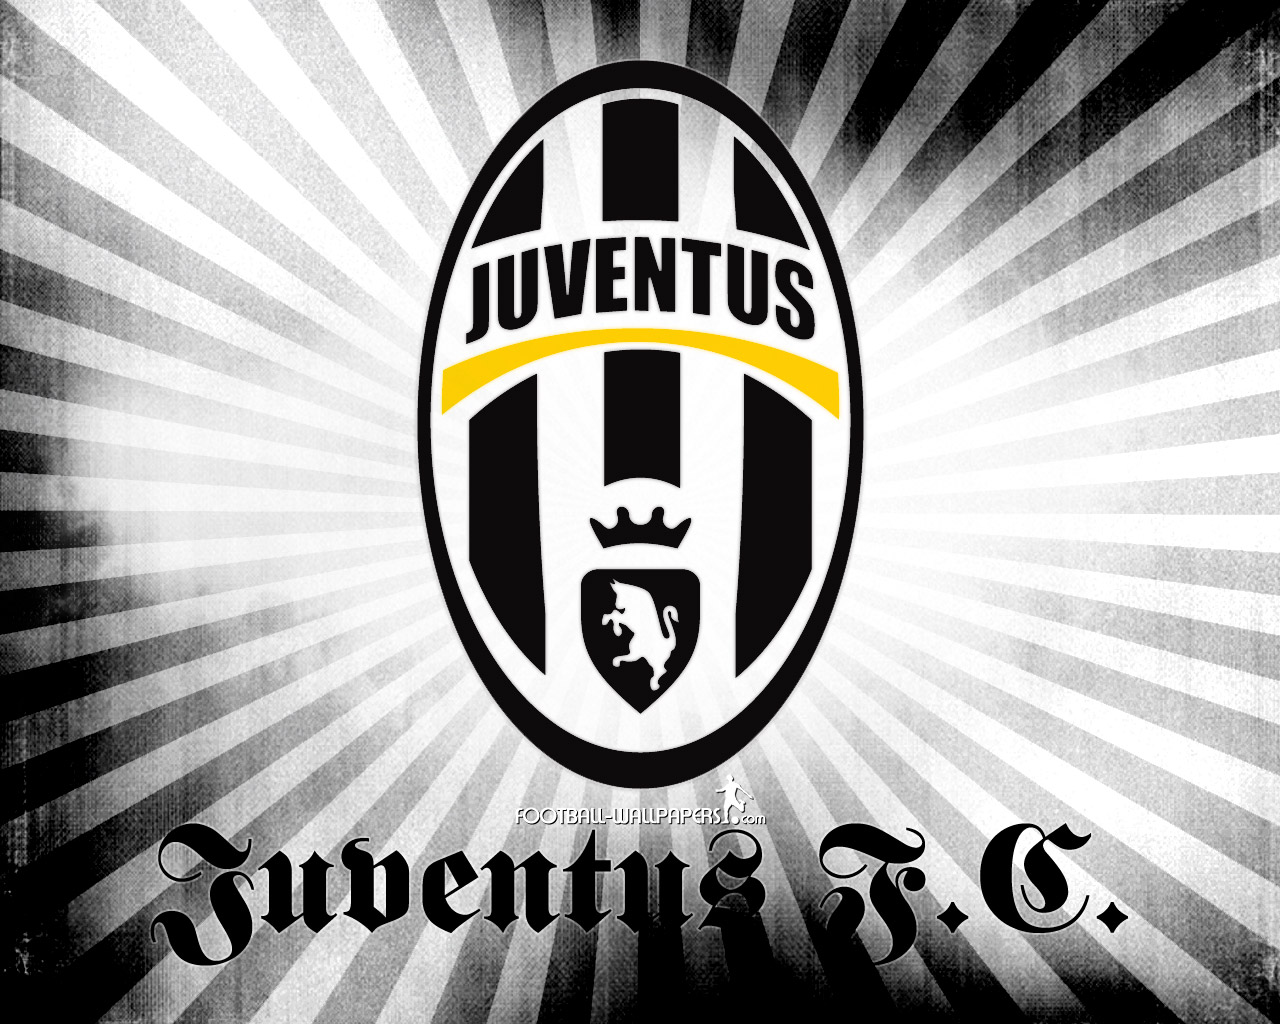 http://3.bp.blogspot.com/-p3cVR9f8EEw/ThhZj_rRlYI/AAAAAAAAA1Y/FmmECKeW18o/s1600/Juventus+Wallpaper+2011+2.jpg